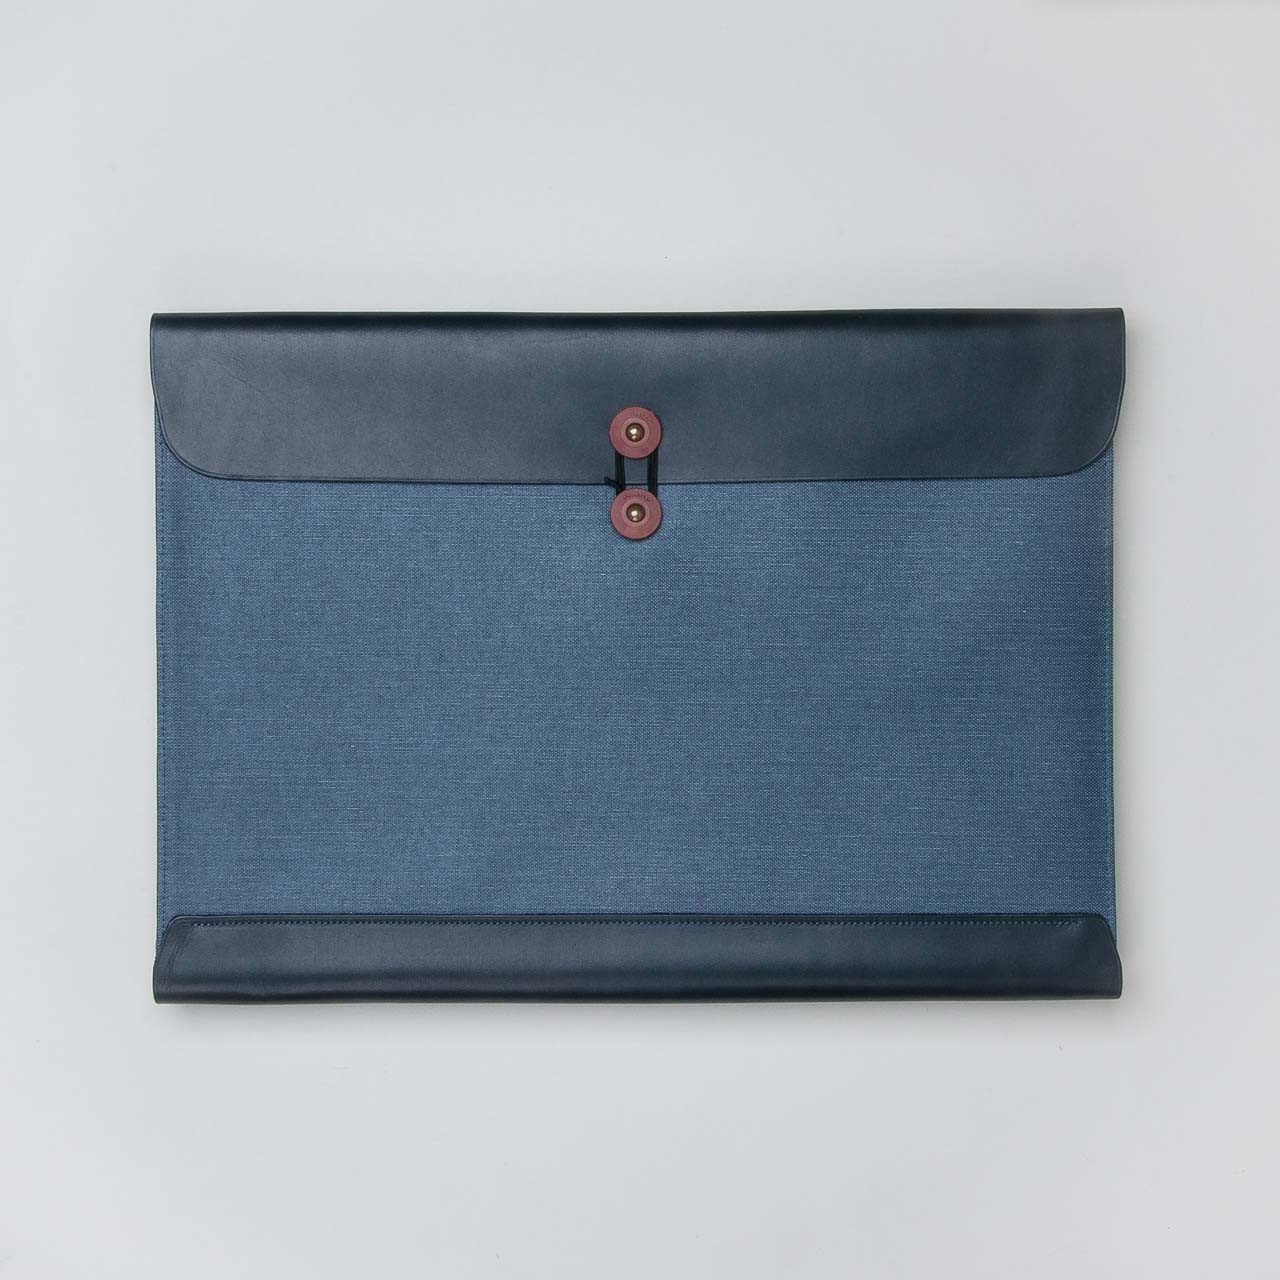 Postalco Legal Envelope blau